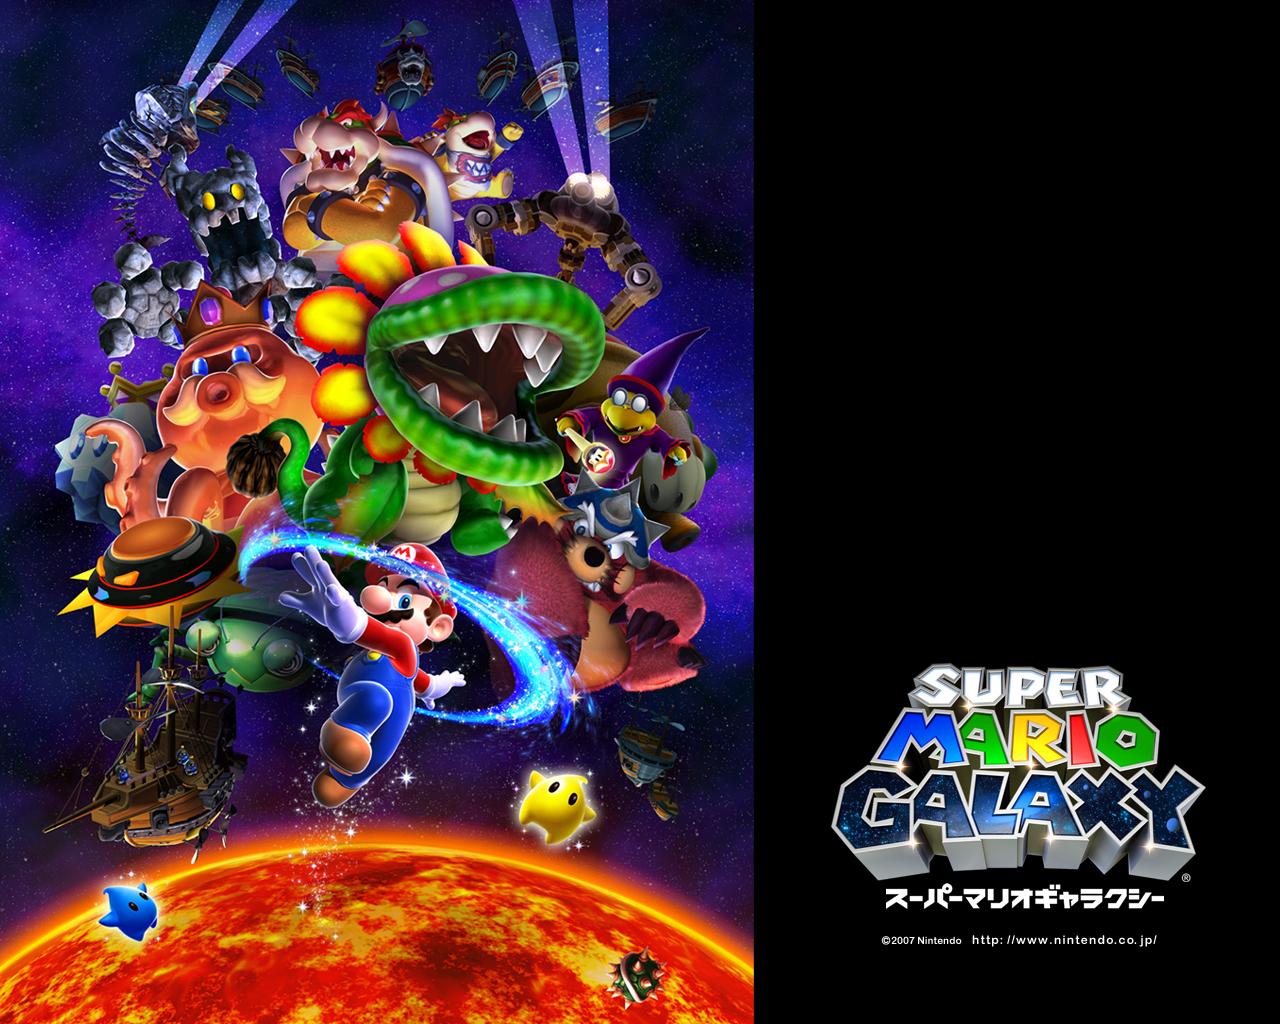 TMK | Downloads | Images | Super Mario Galaxy (Wii)